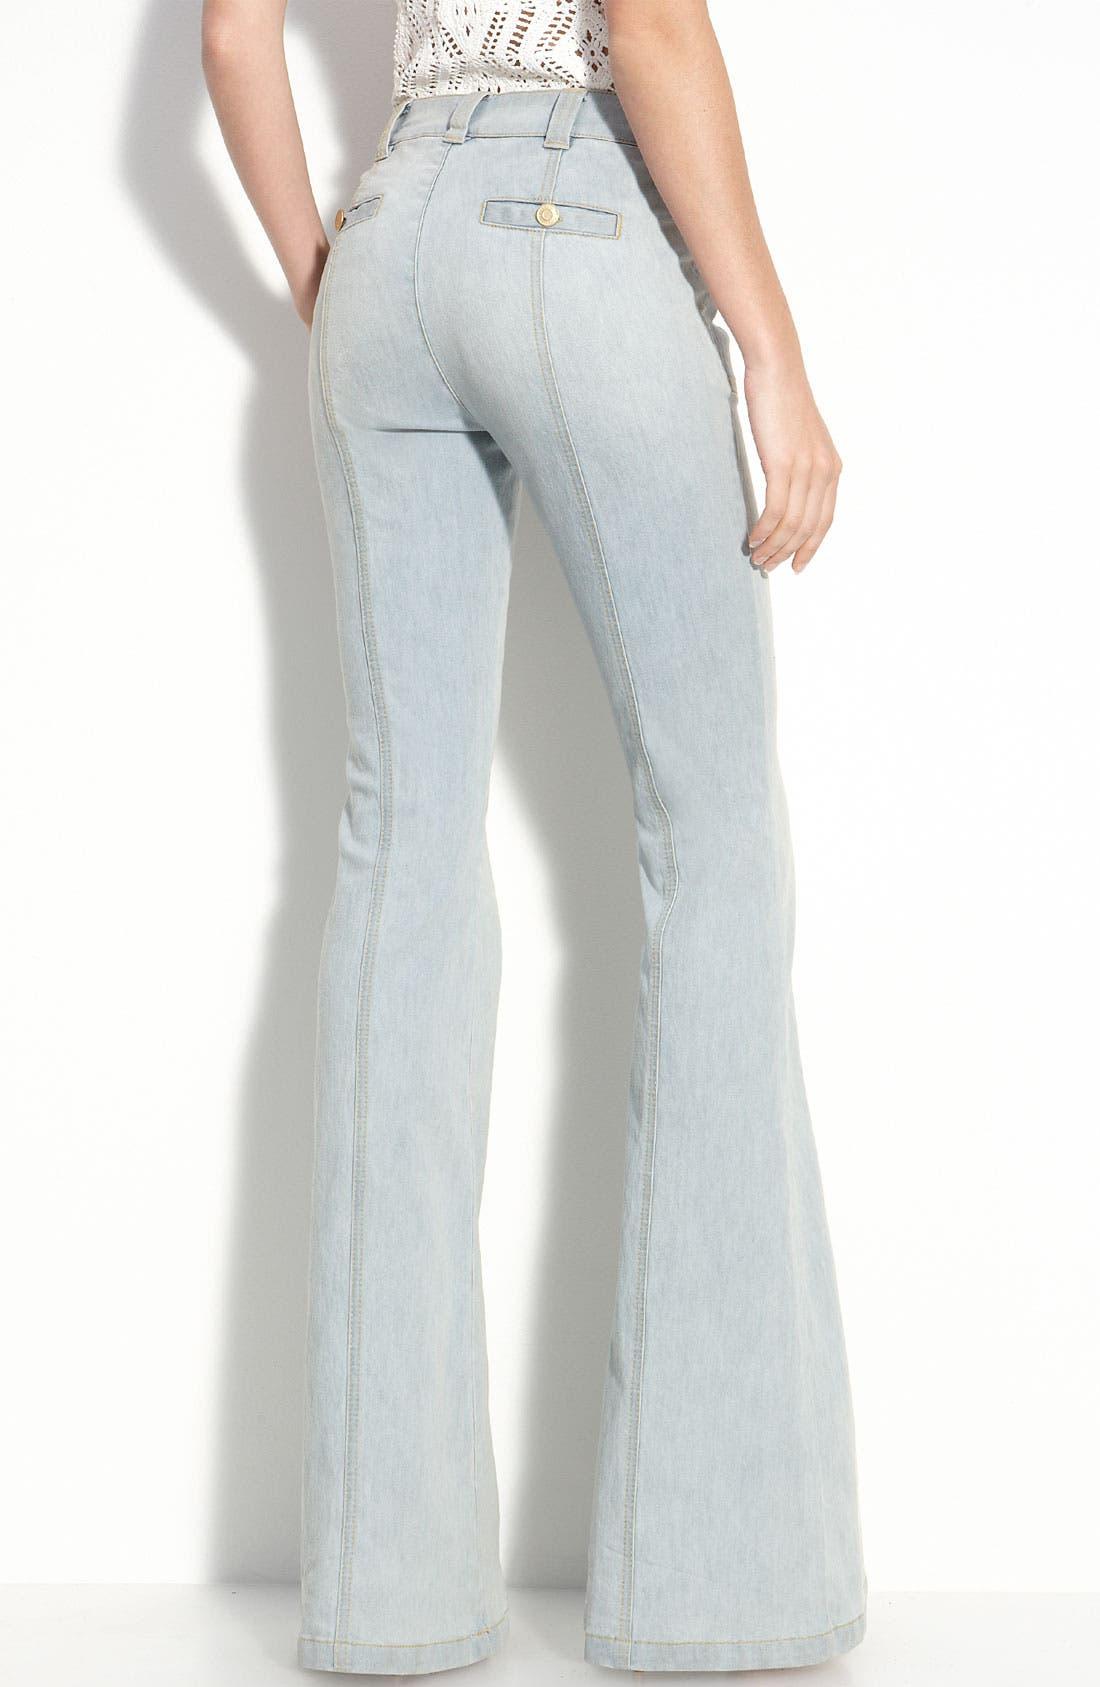 Main Image - Rachel Zoe 'Campbell' Flare Leg Stretch Jeans (Long)